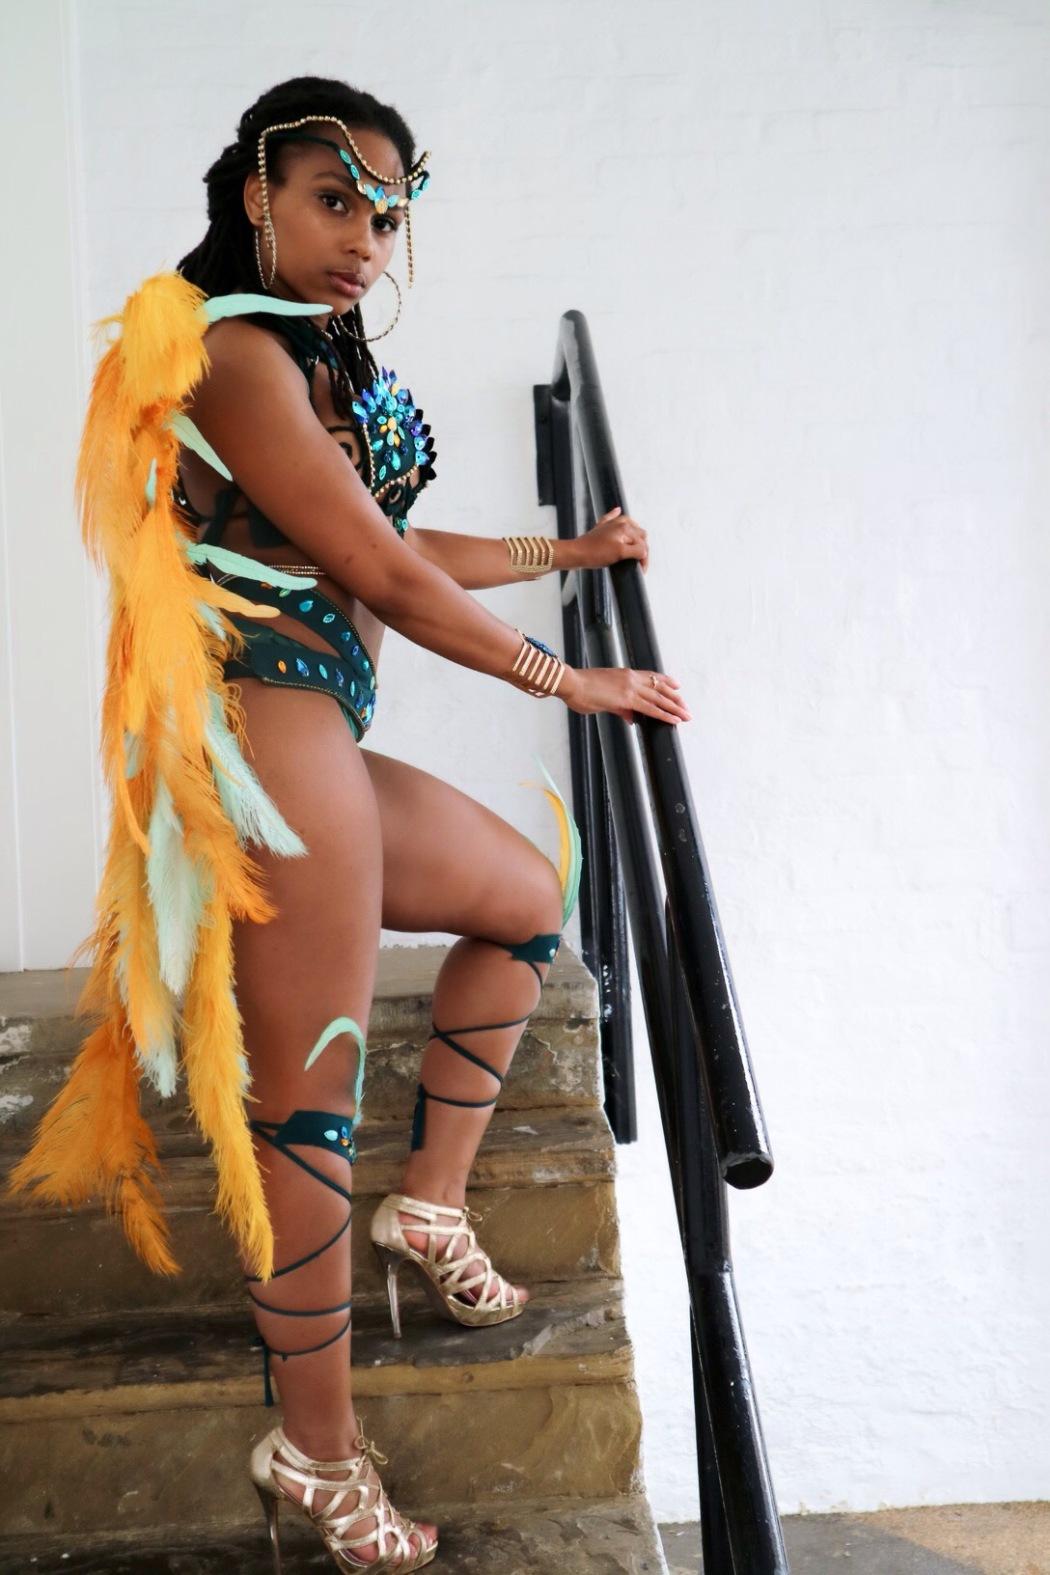 ebony renaissance sankofa notting hill carnival 2019 lanaiya lithe